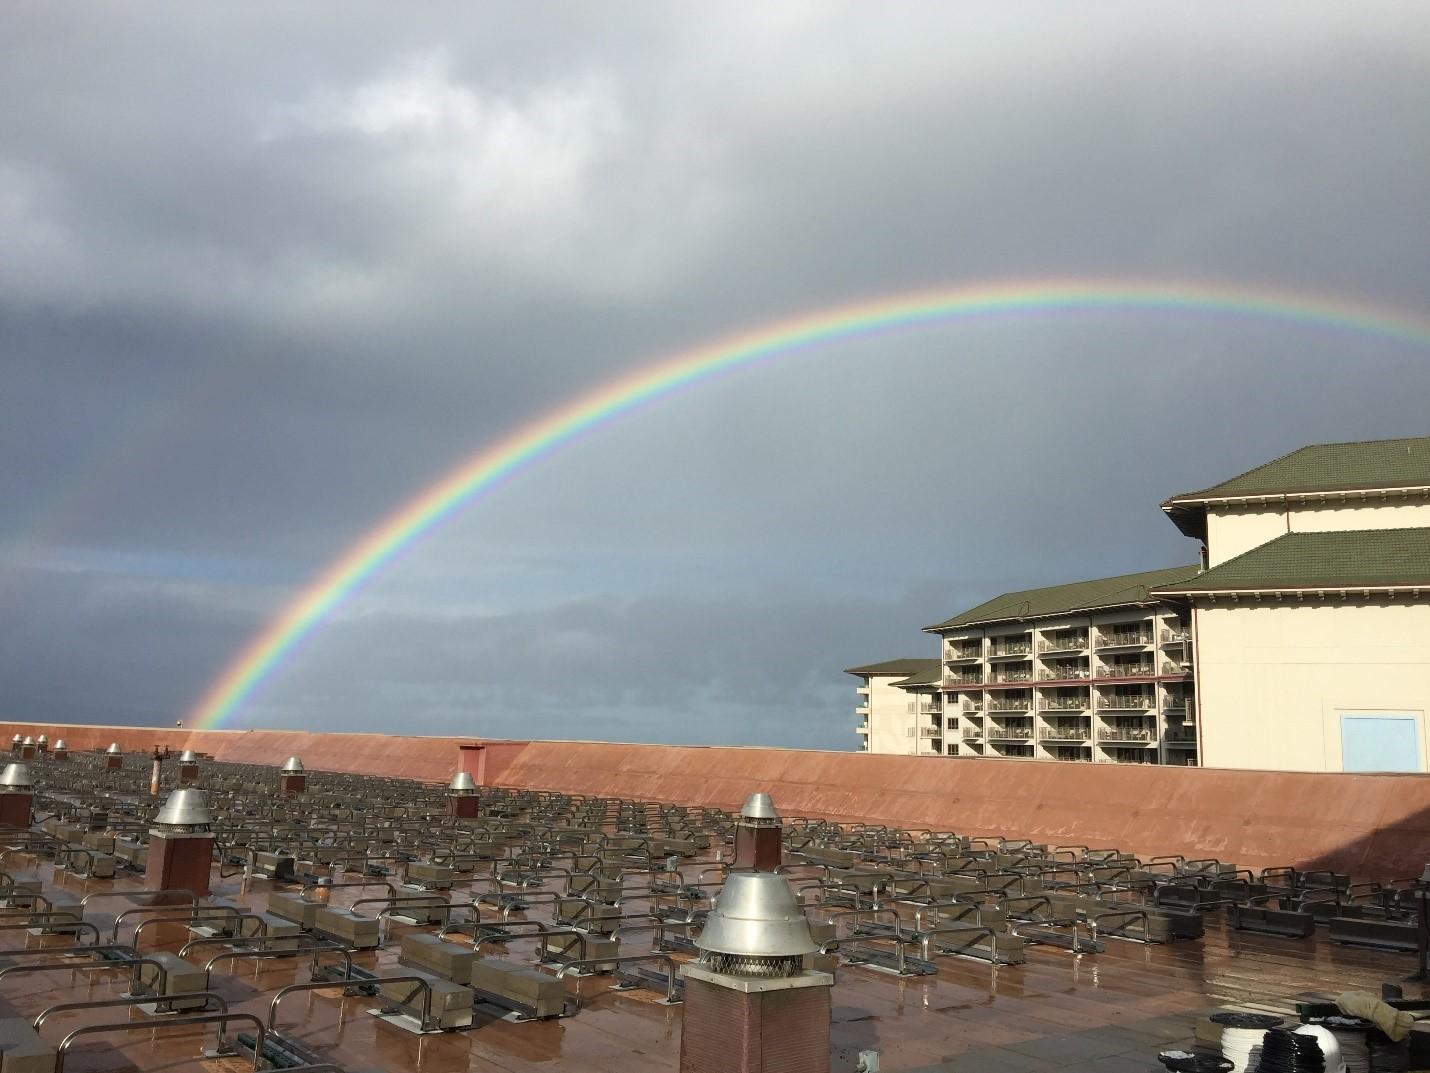 hyatt_rainbow.jpg